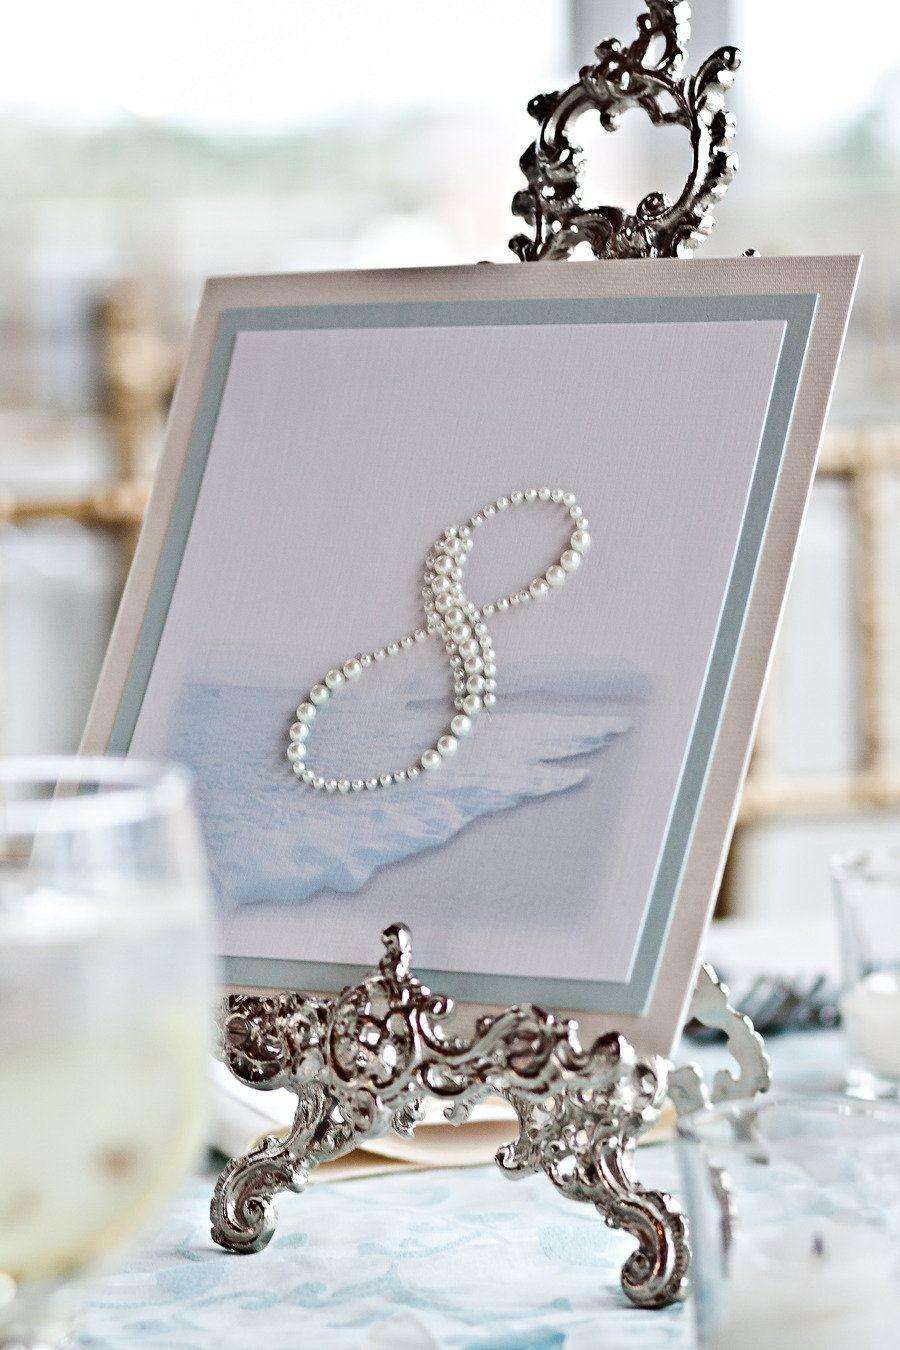 Wedding decoration ideas beach theme  Bonnet Island Estate Wedding by Femina Photo  Design  Table